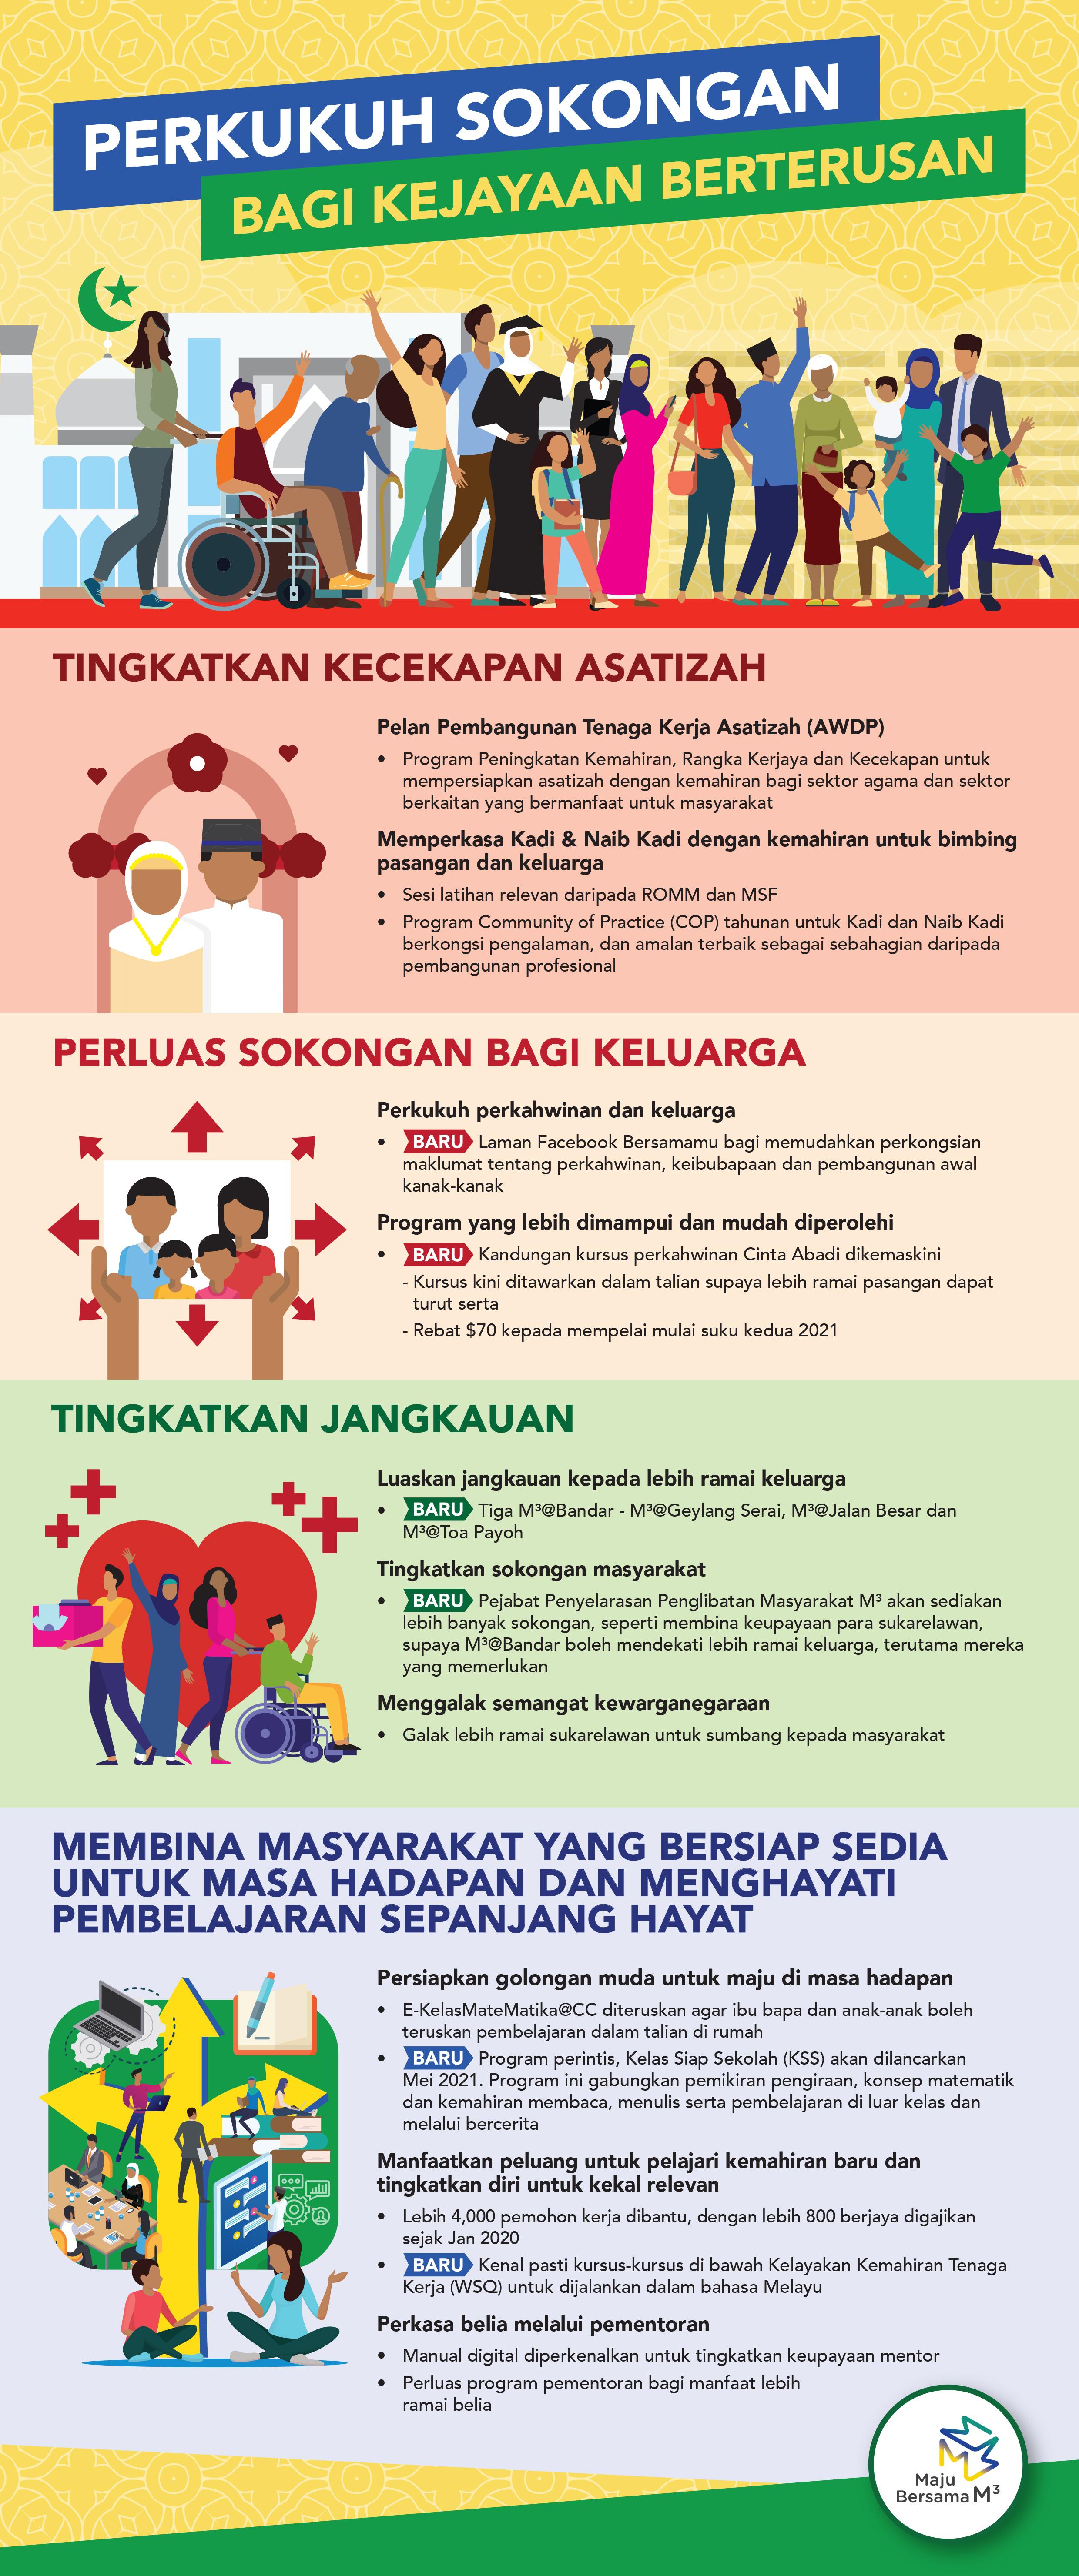 Hari Raya Keynote Speech 2021 Malay